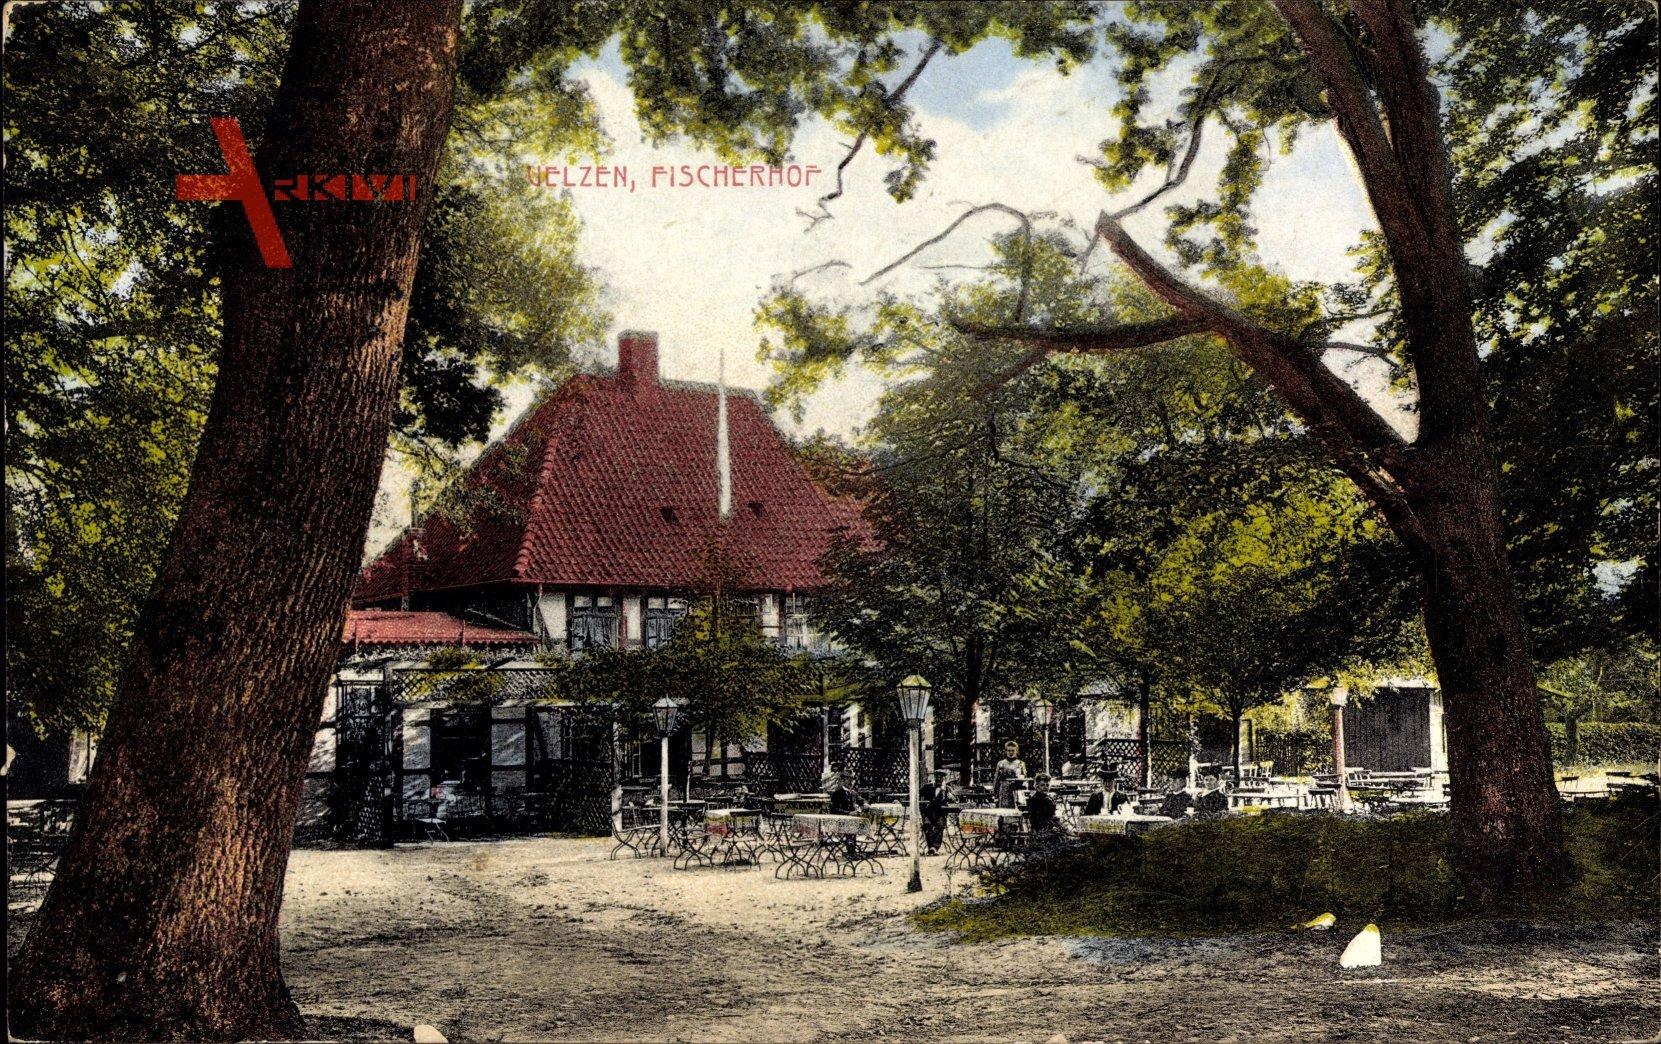 Uelzen in Niedersachsen, Blick in den Garten des Fischerhofes